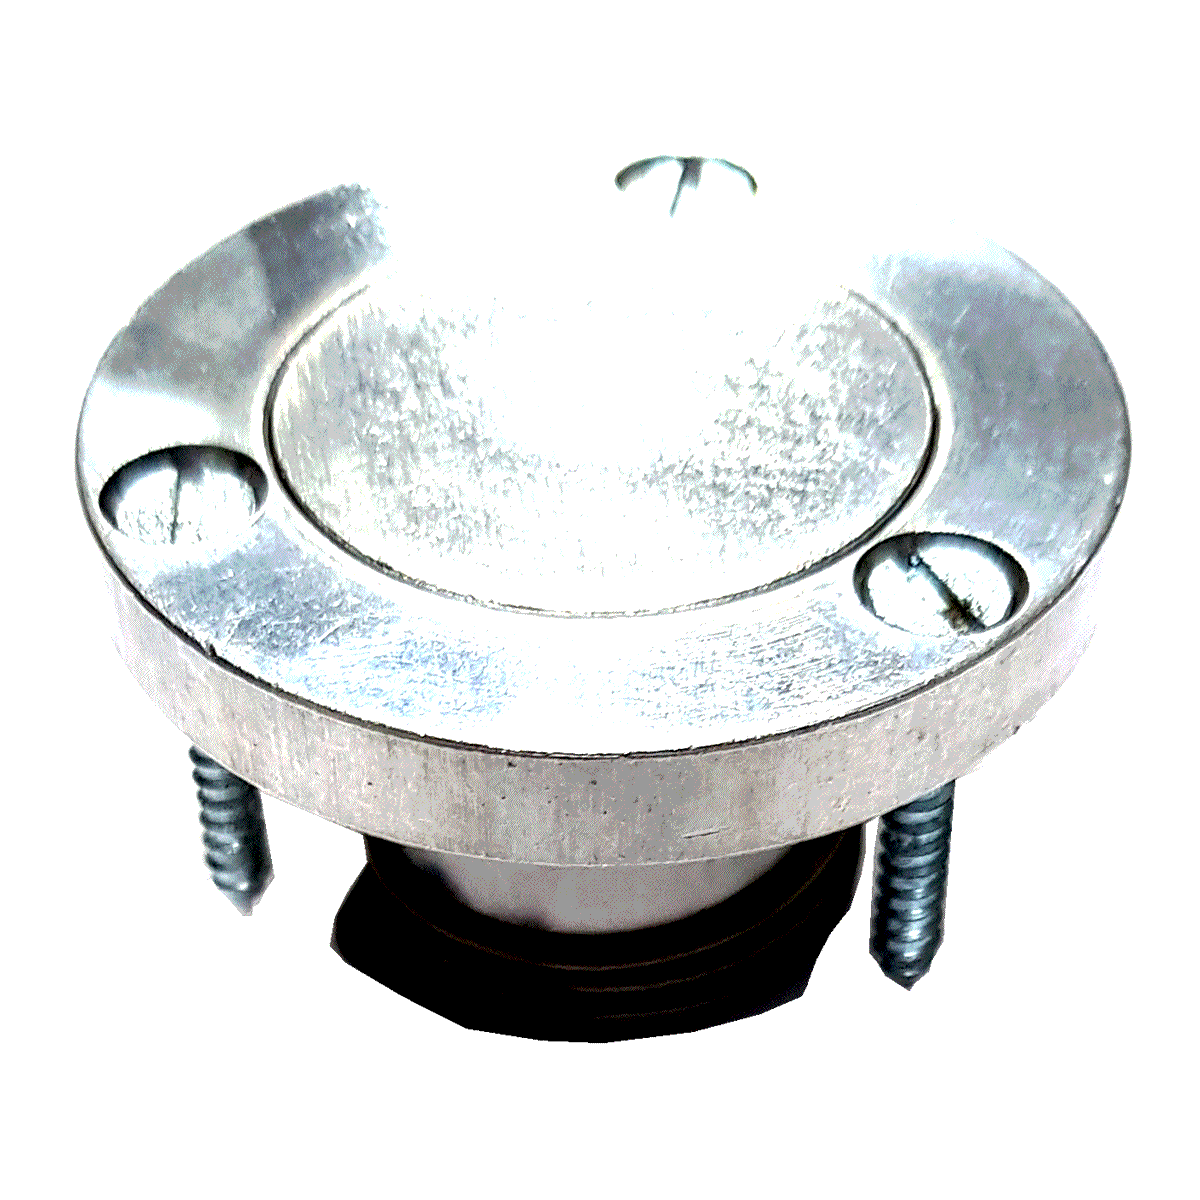 Válvula de Alívio de Backfire ou Estouro no filtro de ar GNV